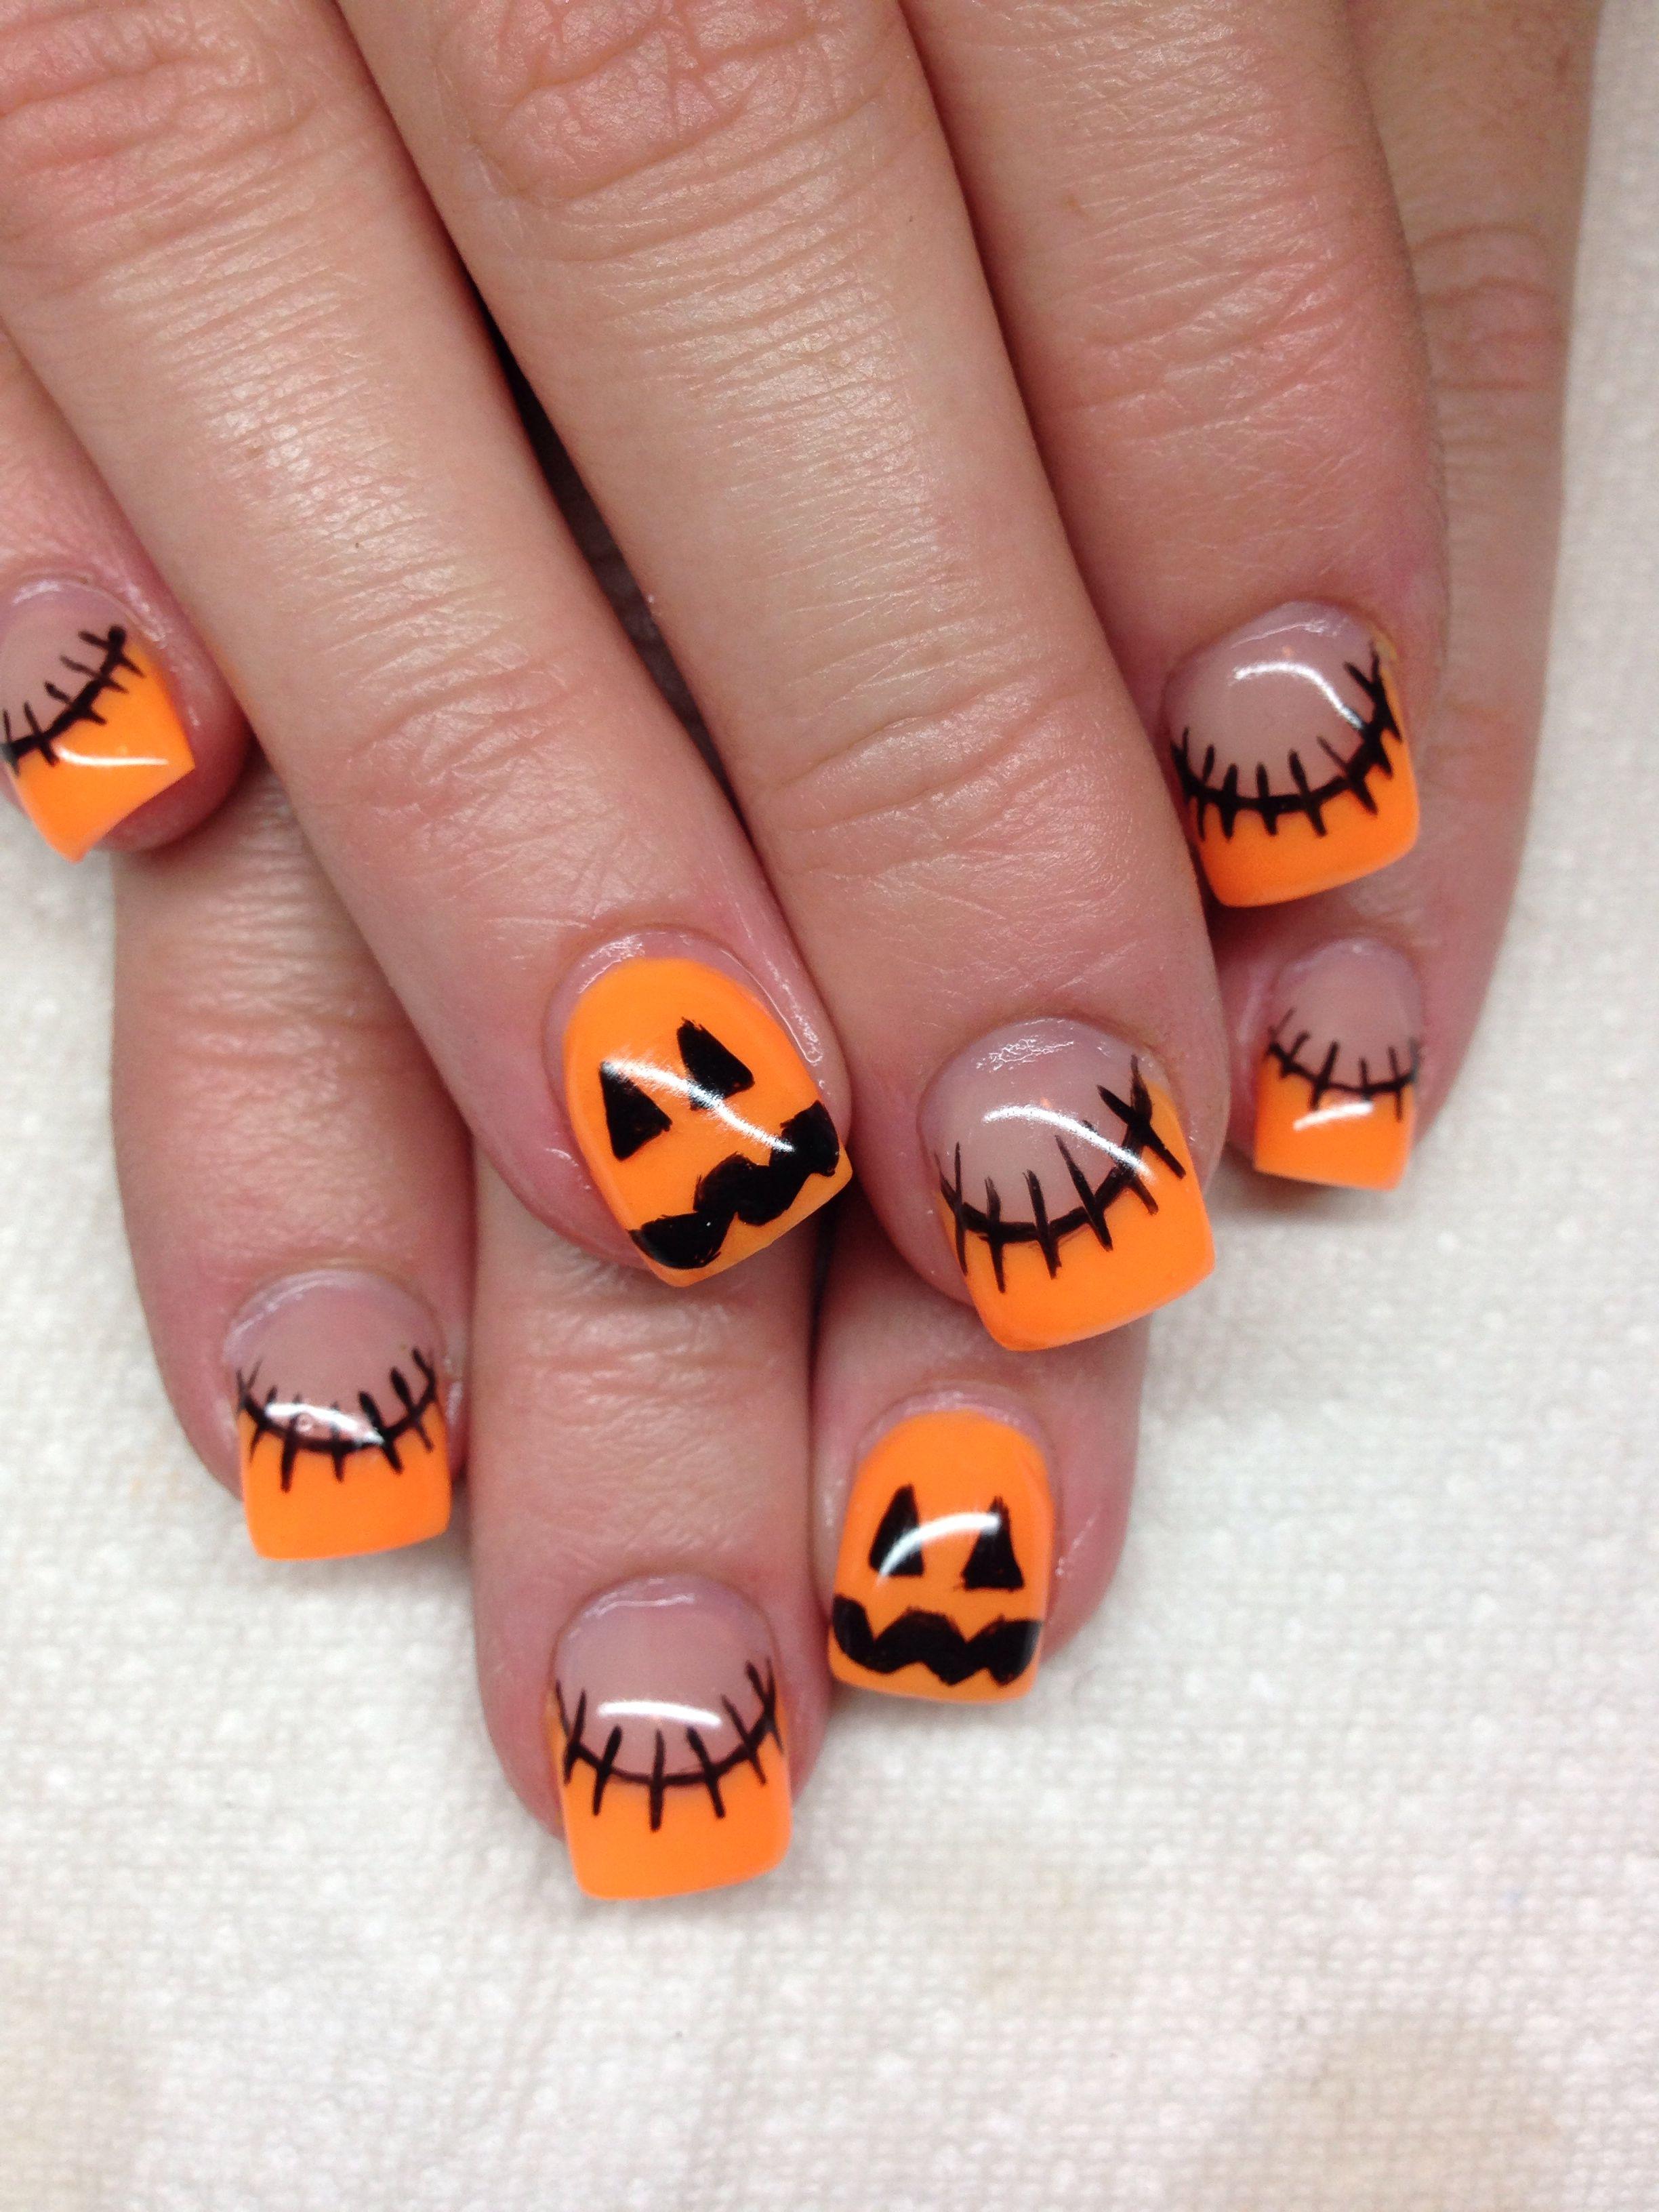 Gel Nails With Hand Drawn Design Using Gel By Melissa Fox Cute Halloween Nails Halloween Acrylic Nails Halloween Nail Designs